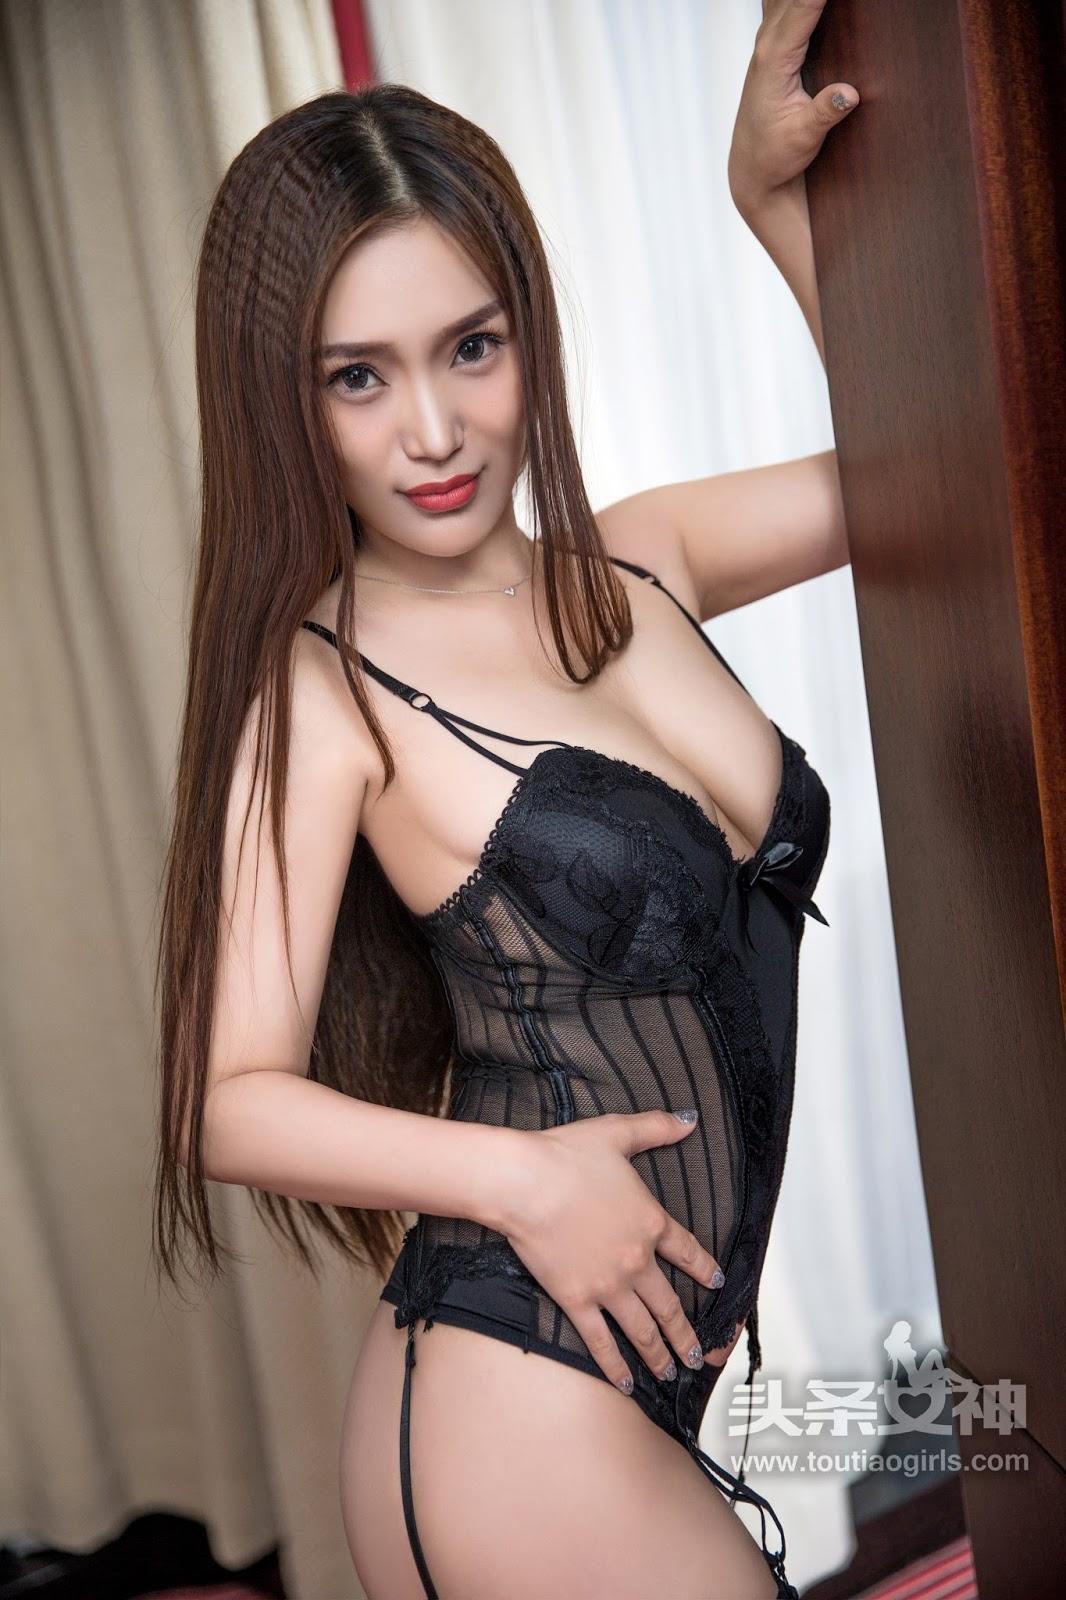 TouTiao 2017-07-15 Xiao Lin (26 pics)